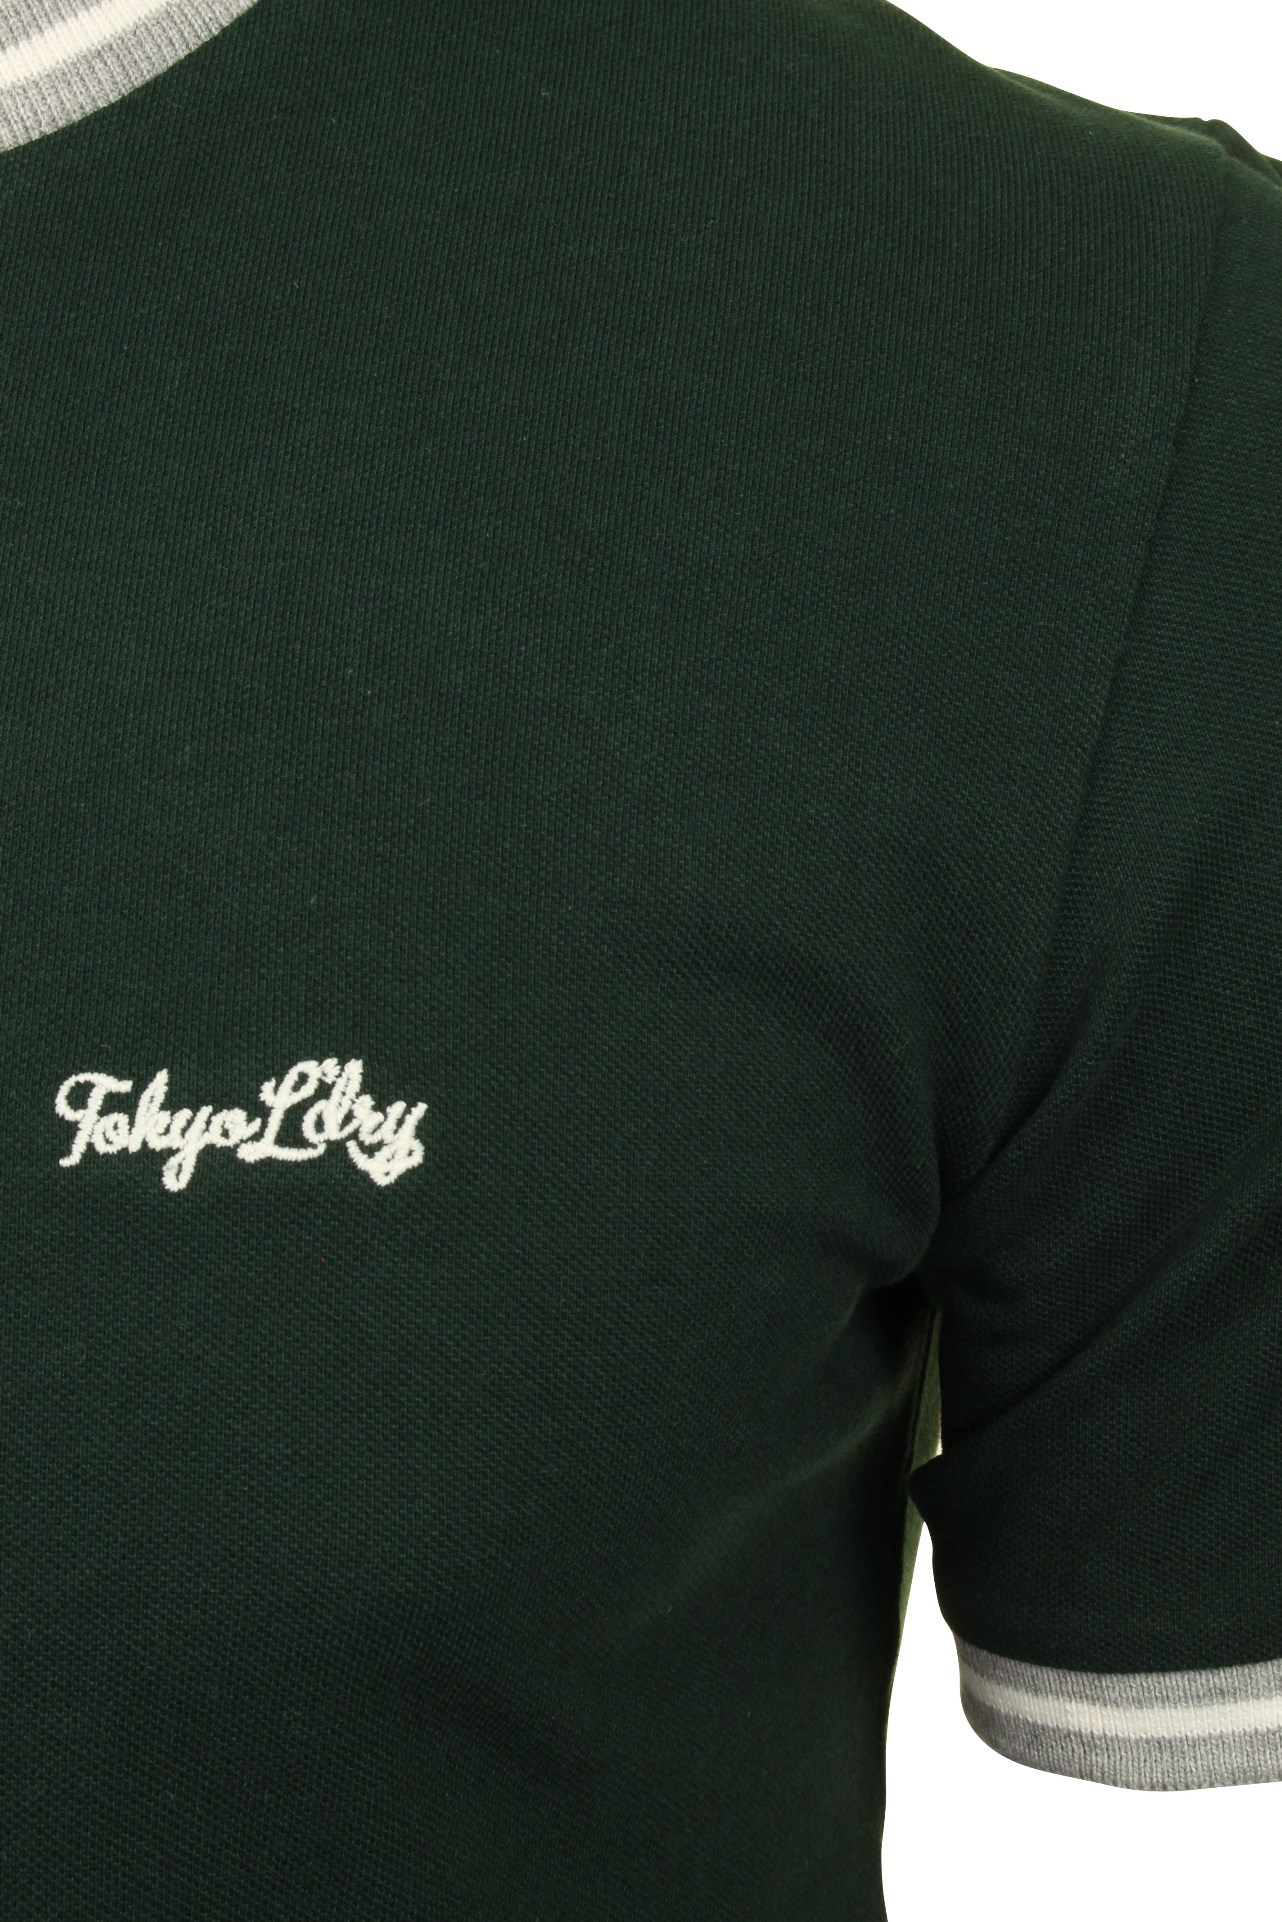 Tokyo-Laundry-Mens-Pique-Crew-Neck-T-Shirt-039-Wentworth-039 thumbnail 10